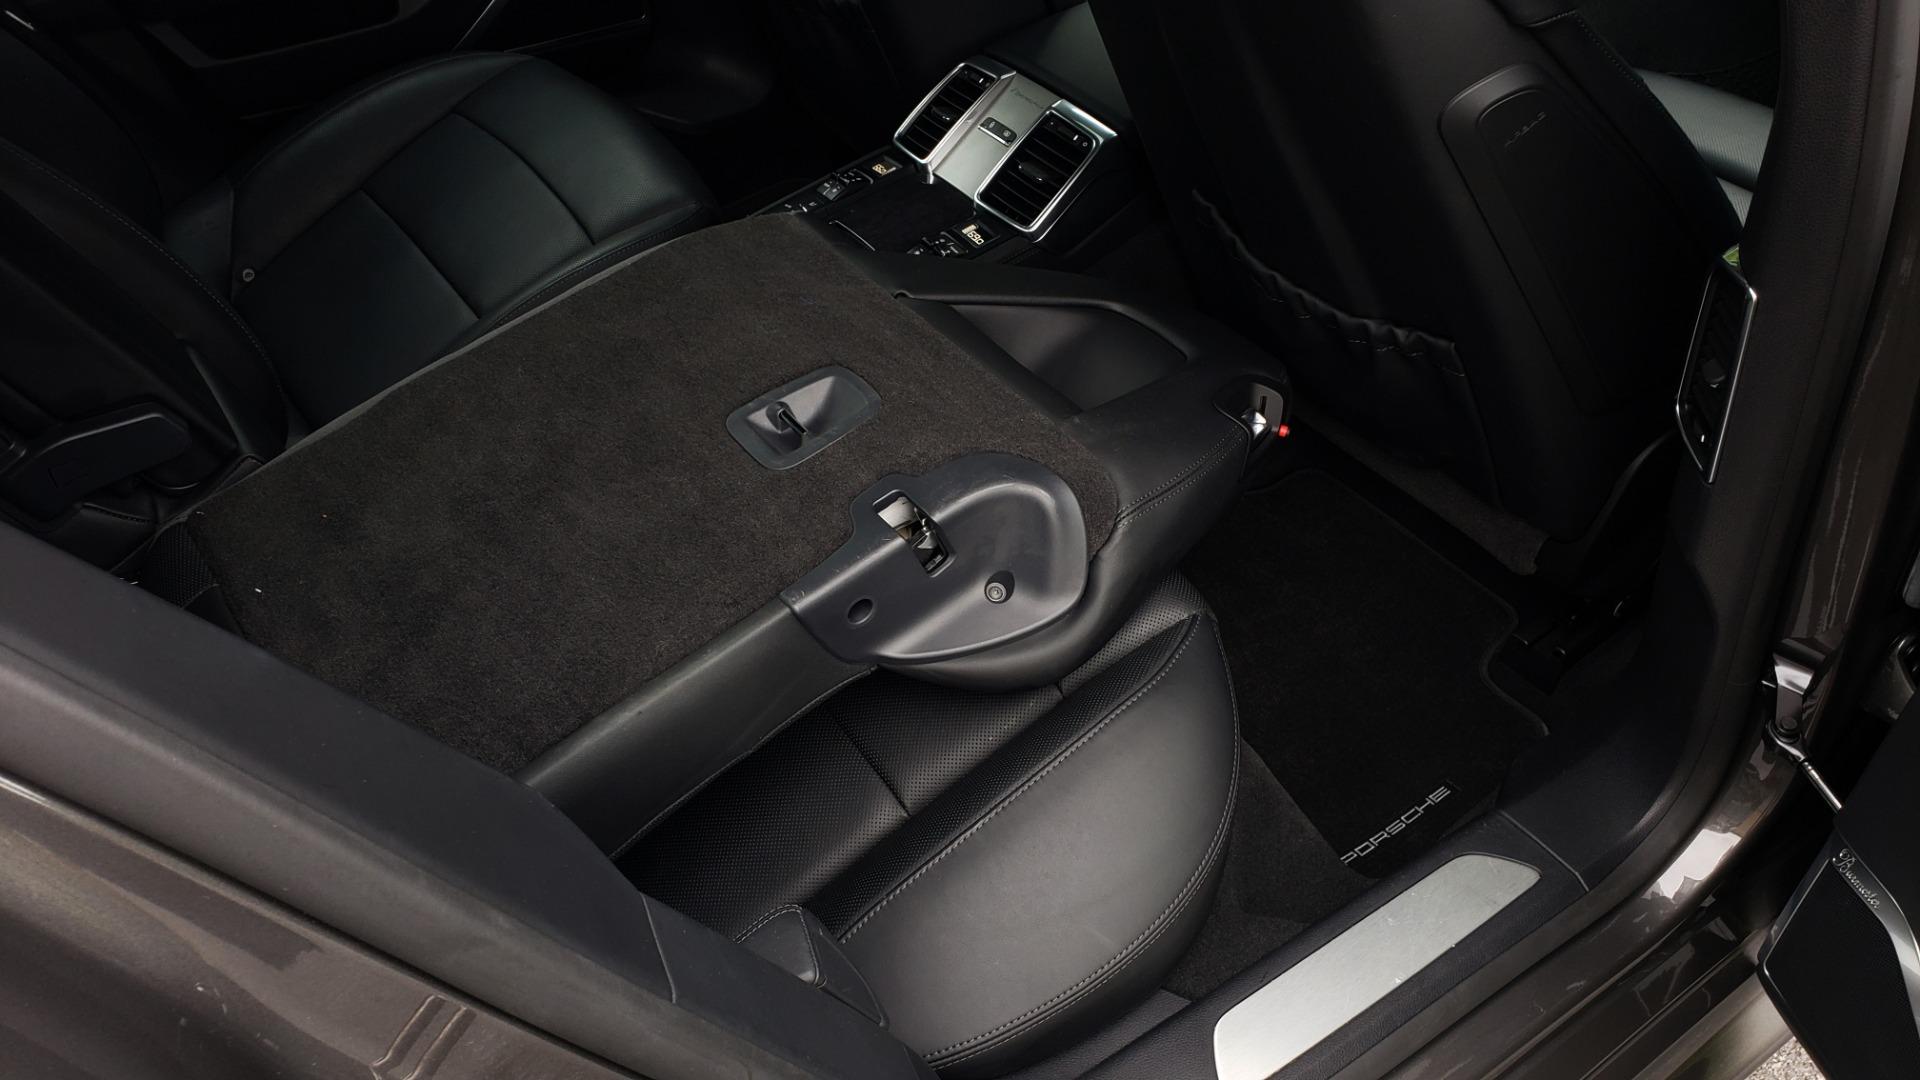 Used 2013 Porsche PANAMERA TURBO 4.8L V8 / AWD / NAV / SUNROOF / LCA / PARK ASST / BURMESTER for sale $45,995 at Formula Imports in Charlotte NC 28227 78